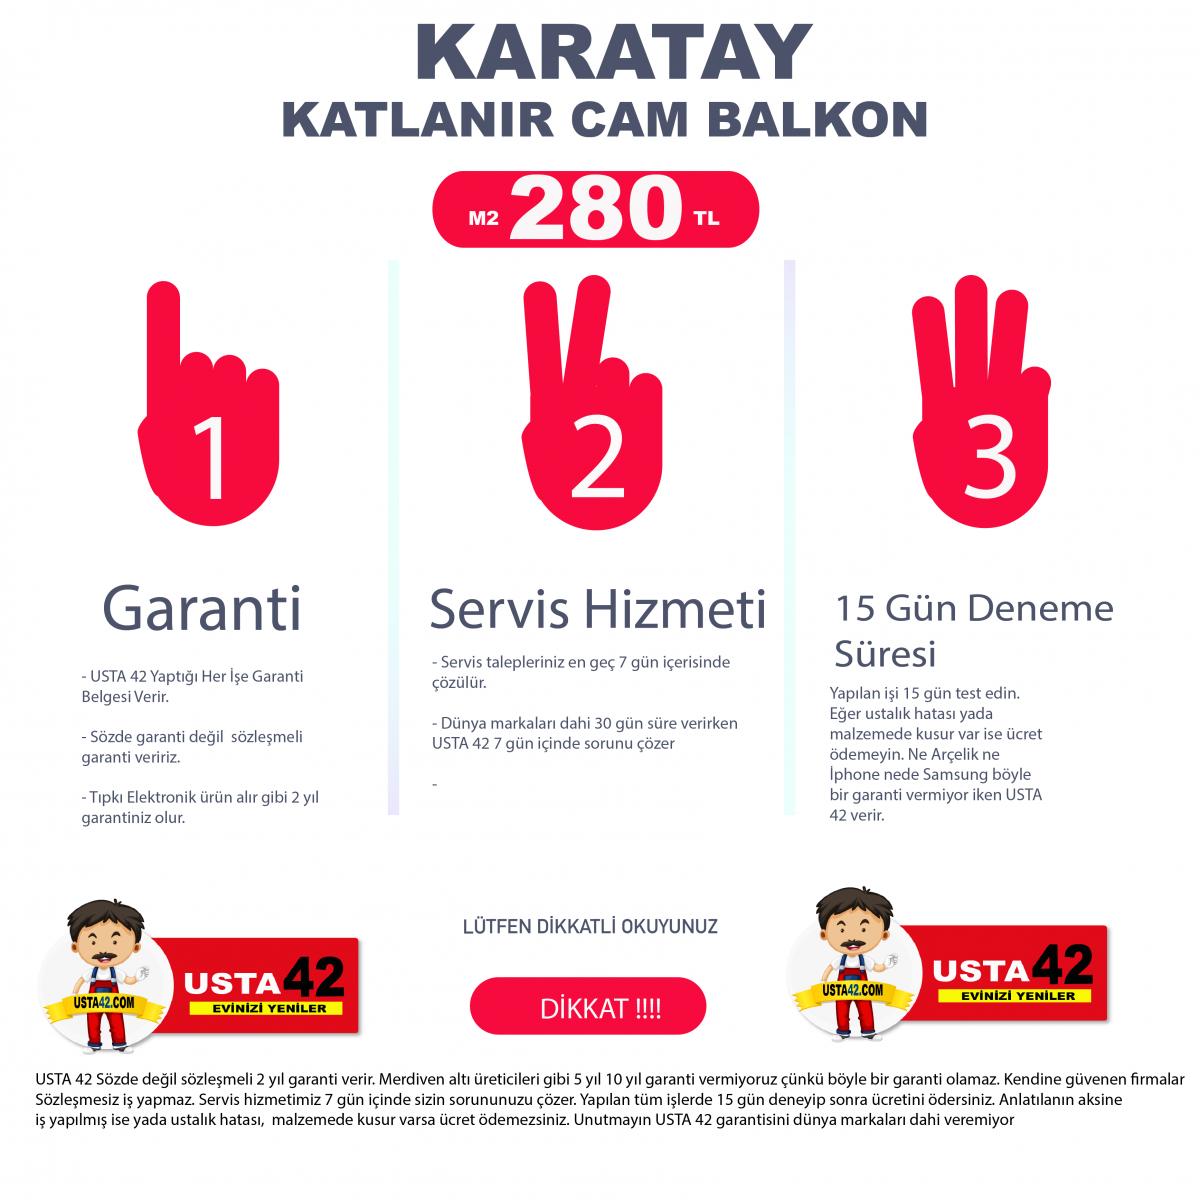 KARATAY CAM BALKON